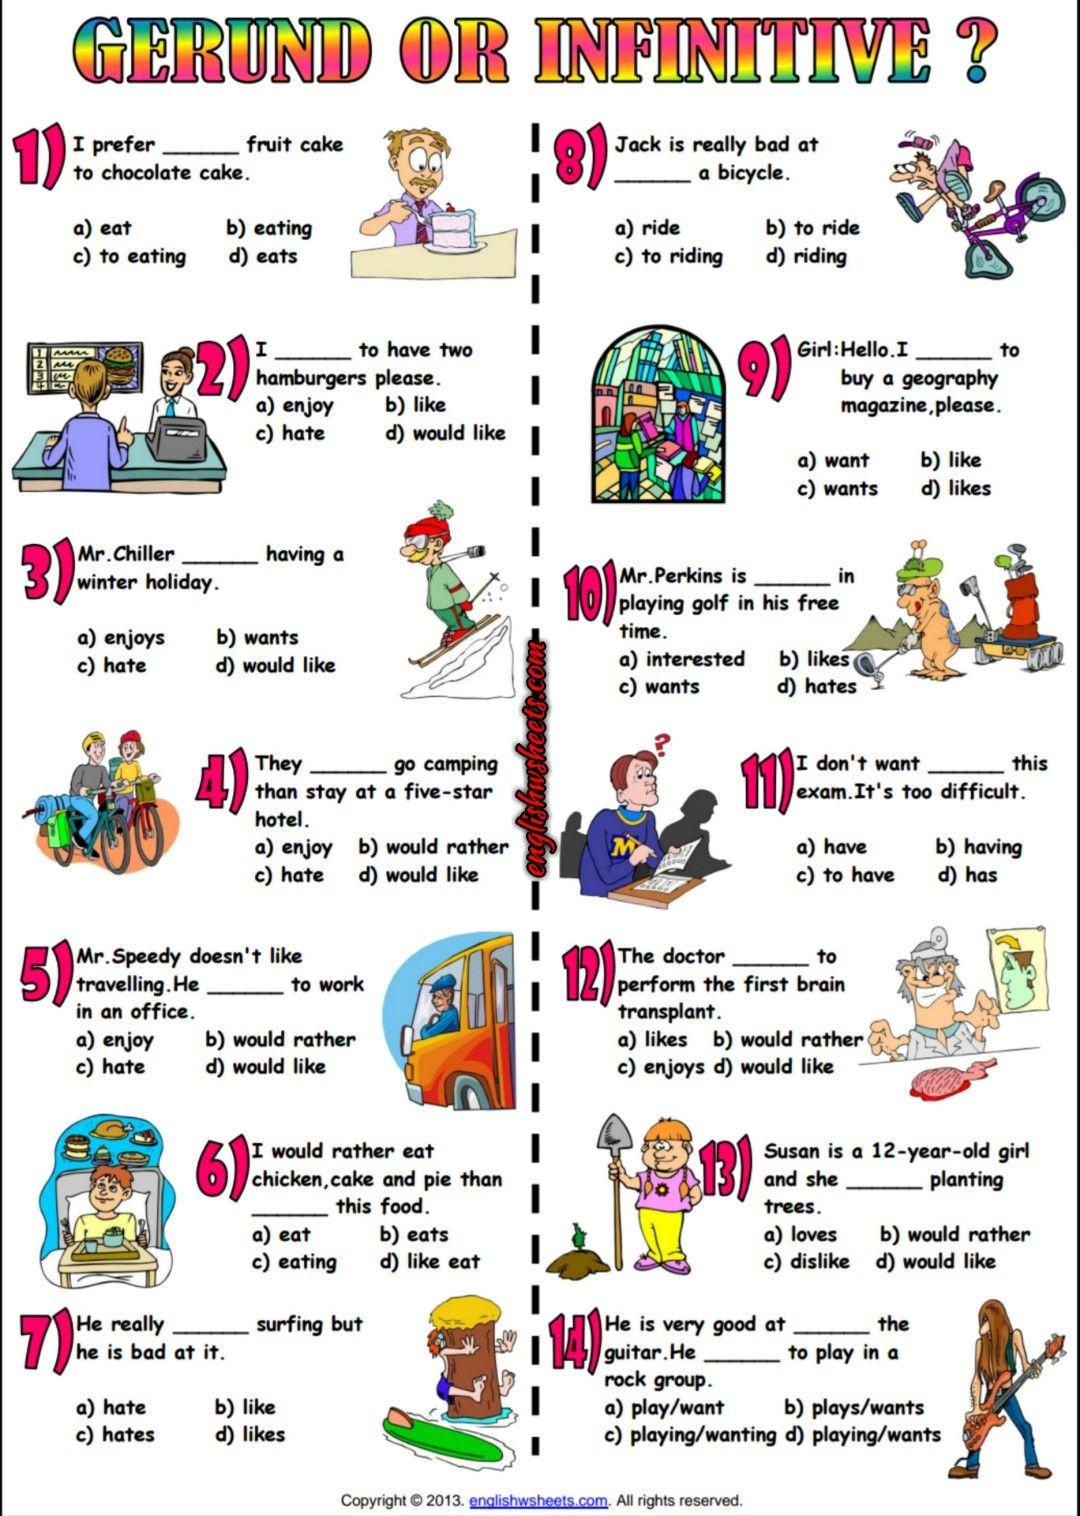 Gerund Or Infinitive Multiple Choice ESL Worksheet   English teaching  materials [ 1516 x 1080 Pixel ]